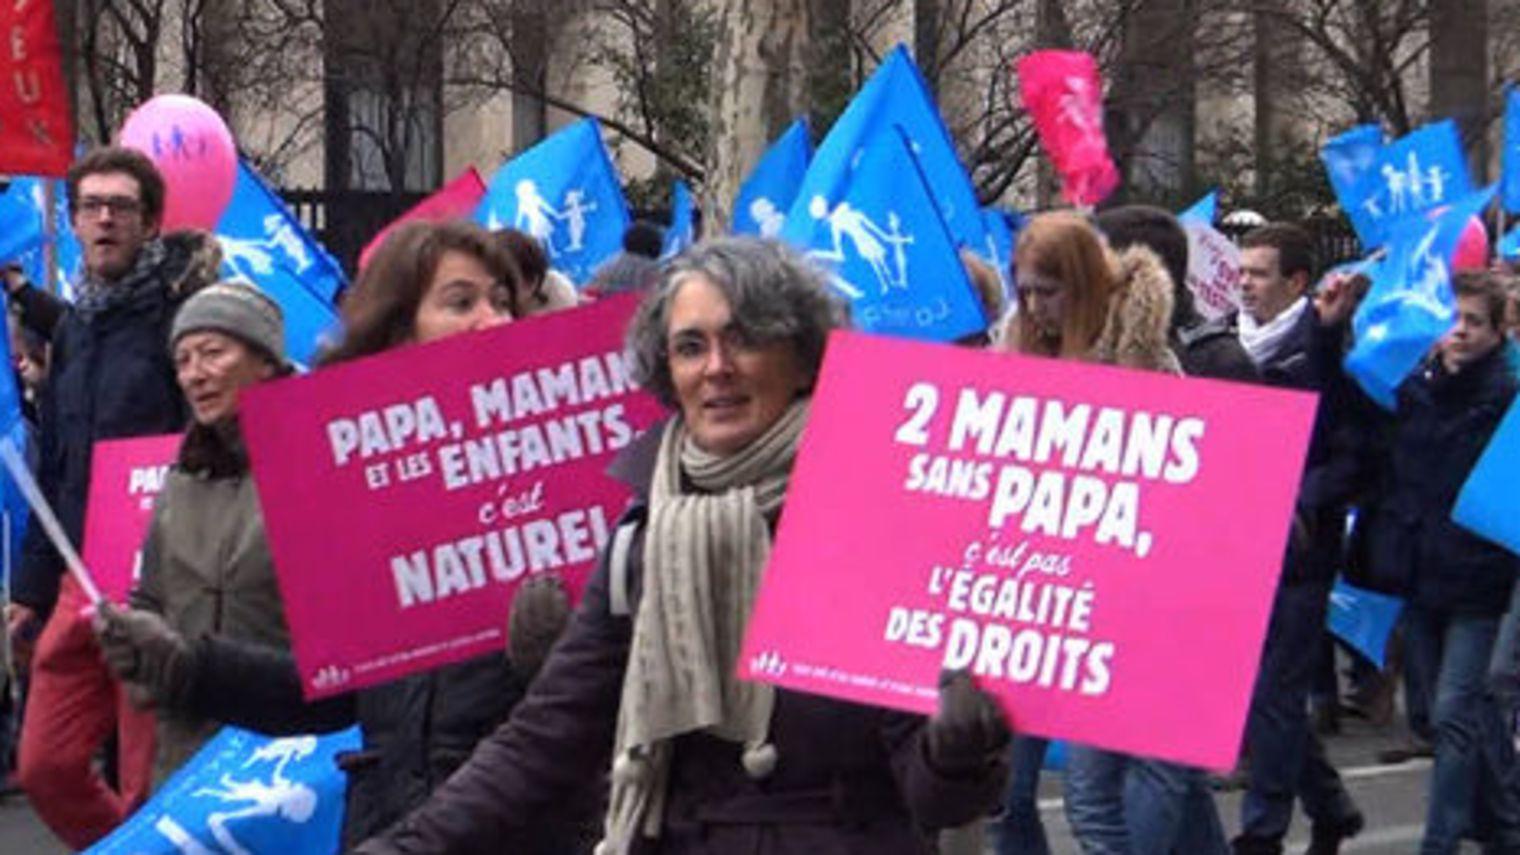 Manifestation anti mariage pour tous, Paris.